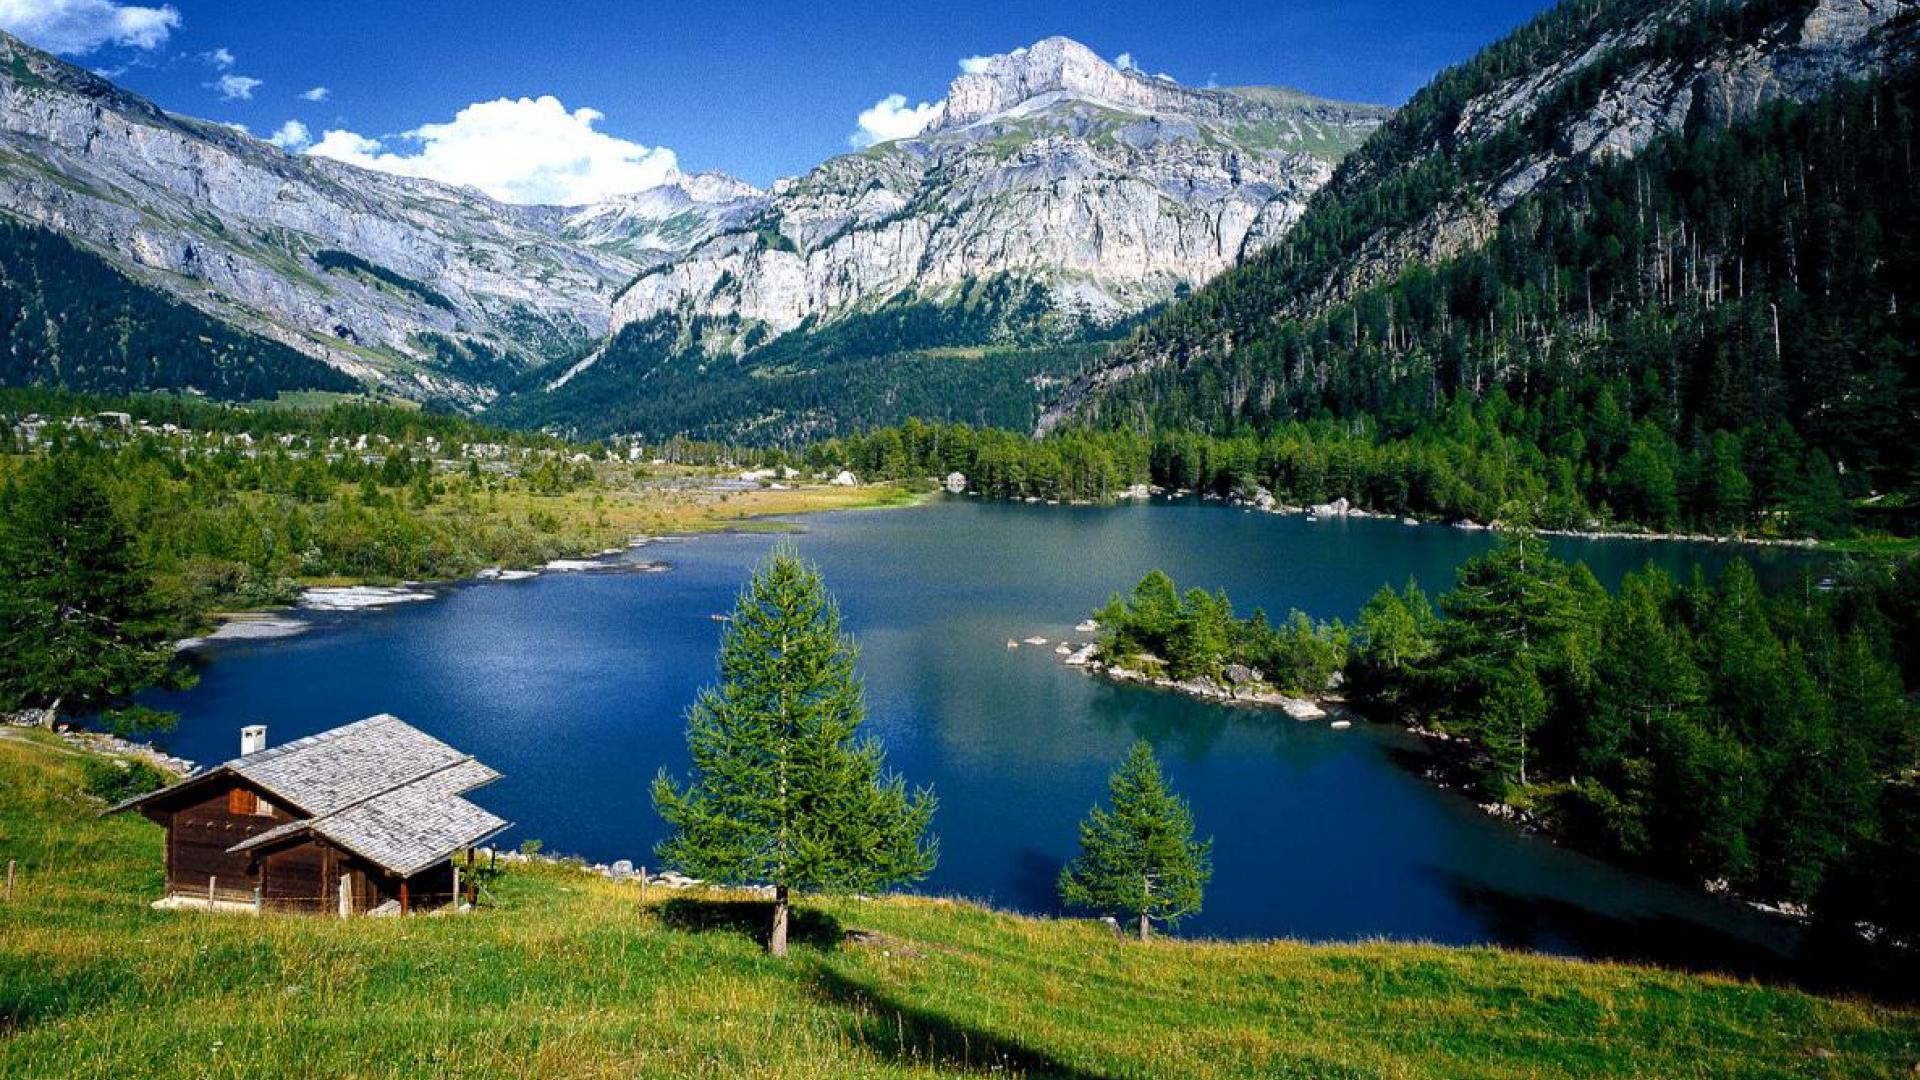 Switzerland Pictures